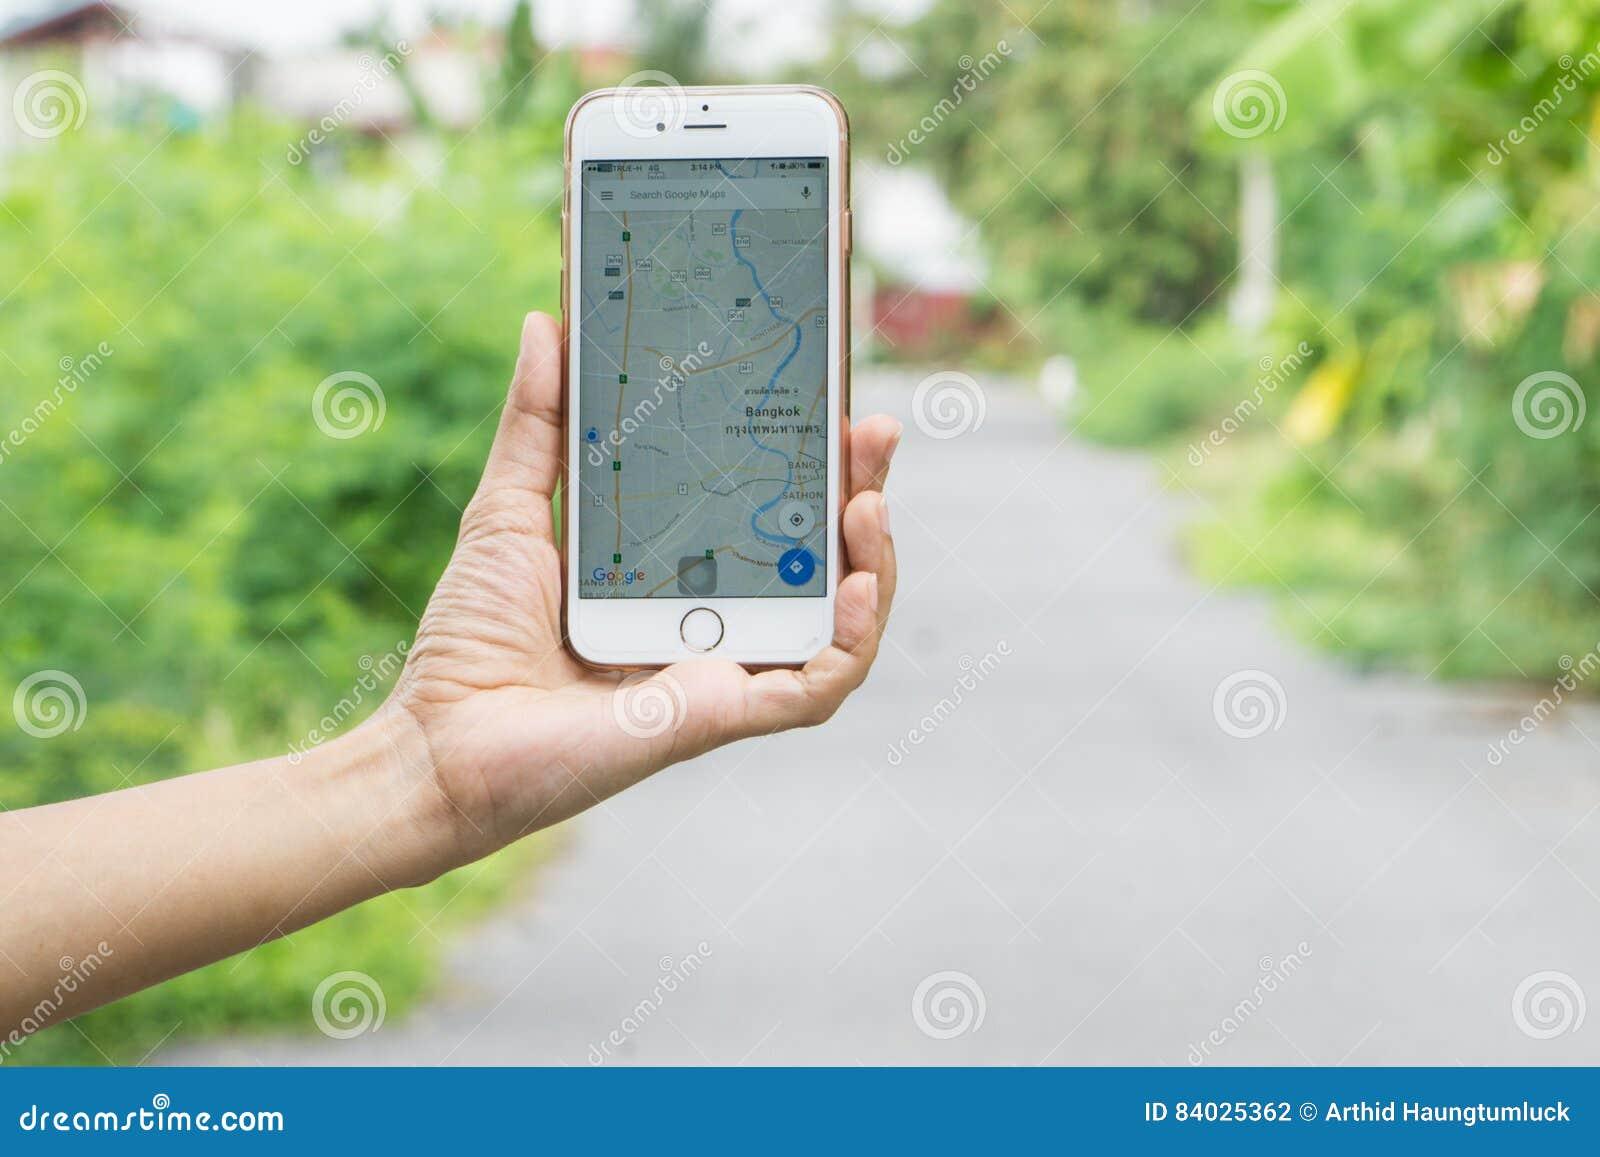 BANGKOK, THAILAND ,Google Map app display on iphone screen in female hands